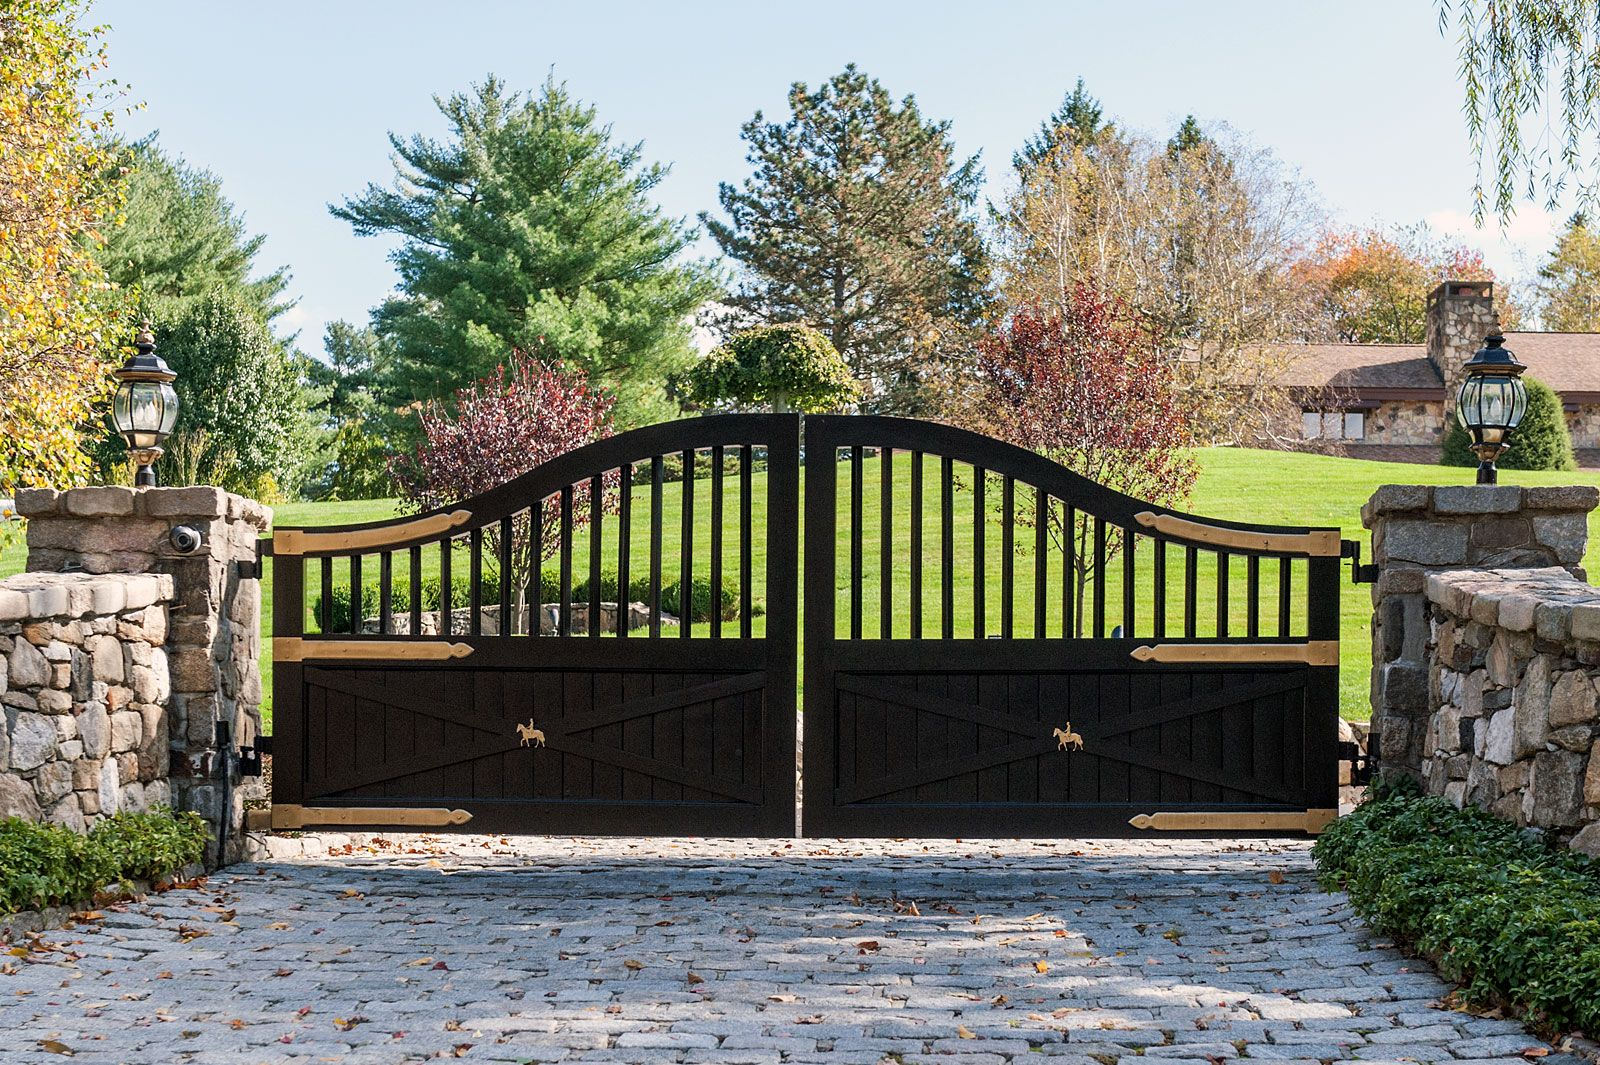 Black Classic Ranch Or Farmhouse Automated Driveway Gate With Unique Gold Painted Iron Horse Details D Driveway Gate Village House Design Wood Gates Driveway